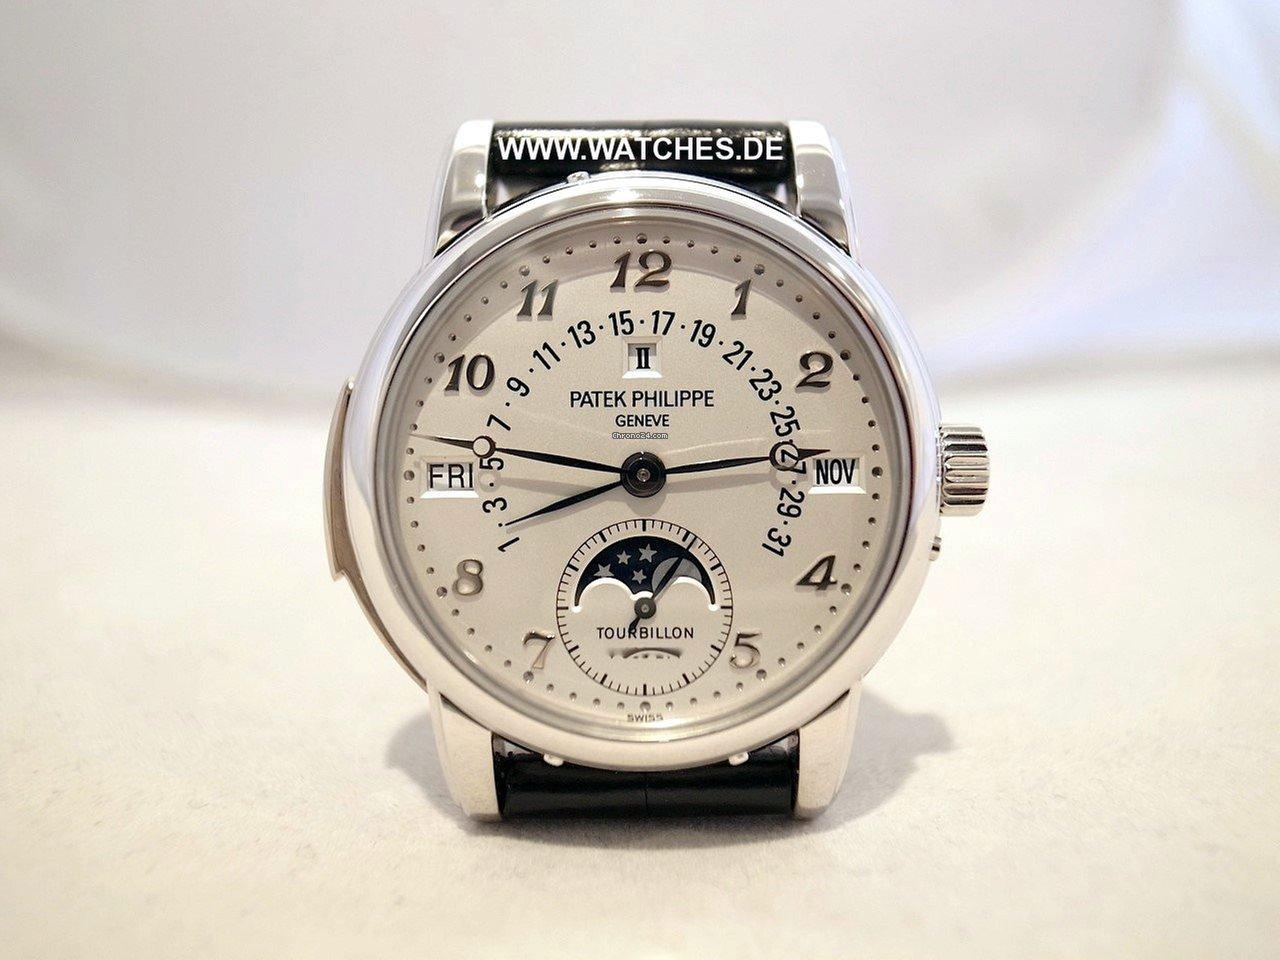 161738c0caa Comprar relógios Patek Philippe